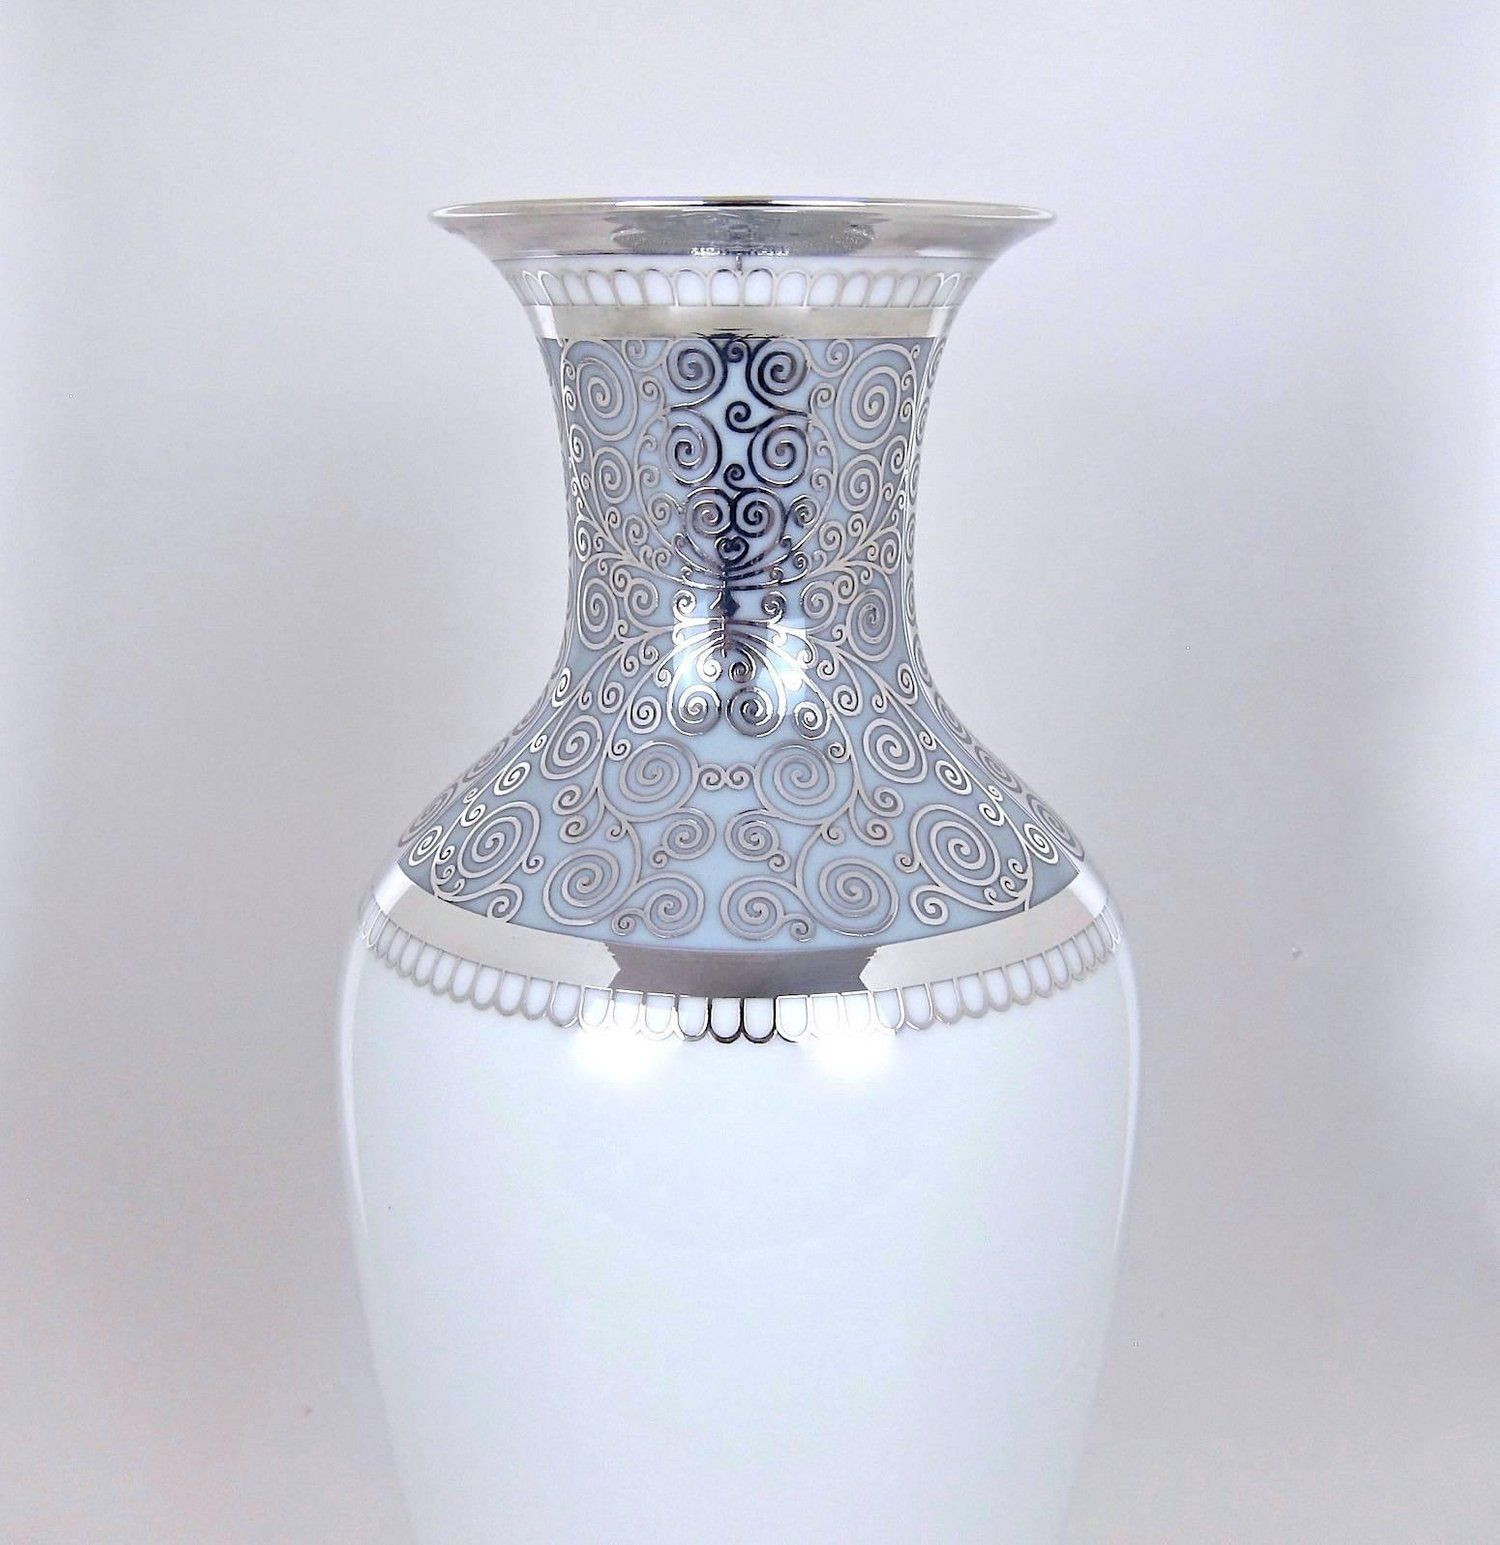 half vase wall decor of 18 mid century glass vase the weekly world with 18 mid century glass vase